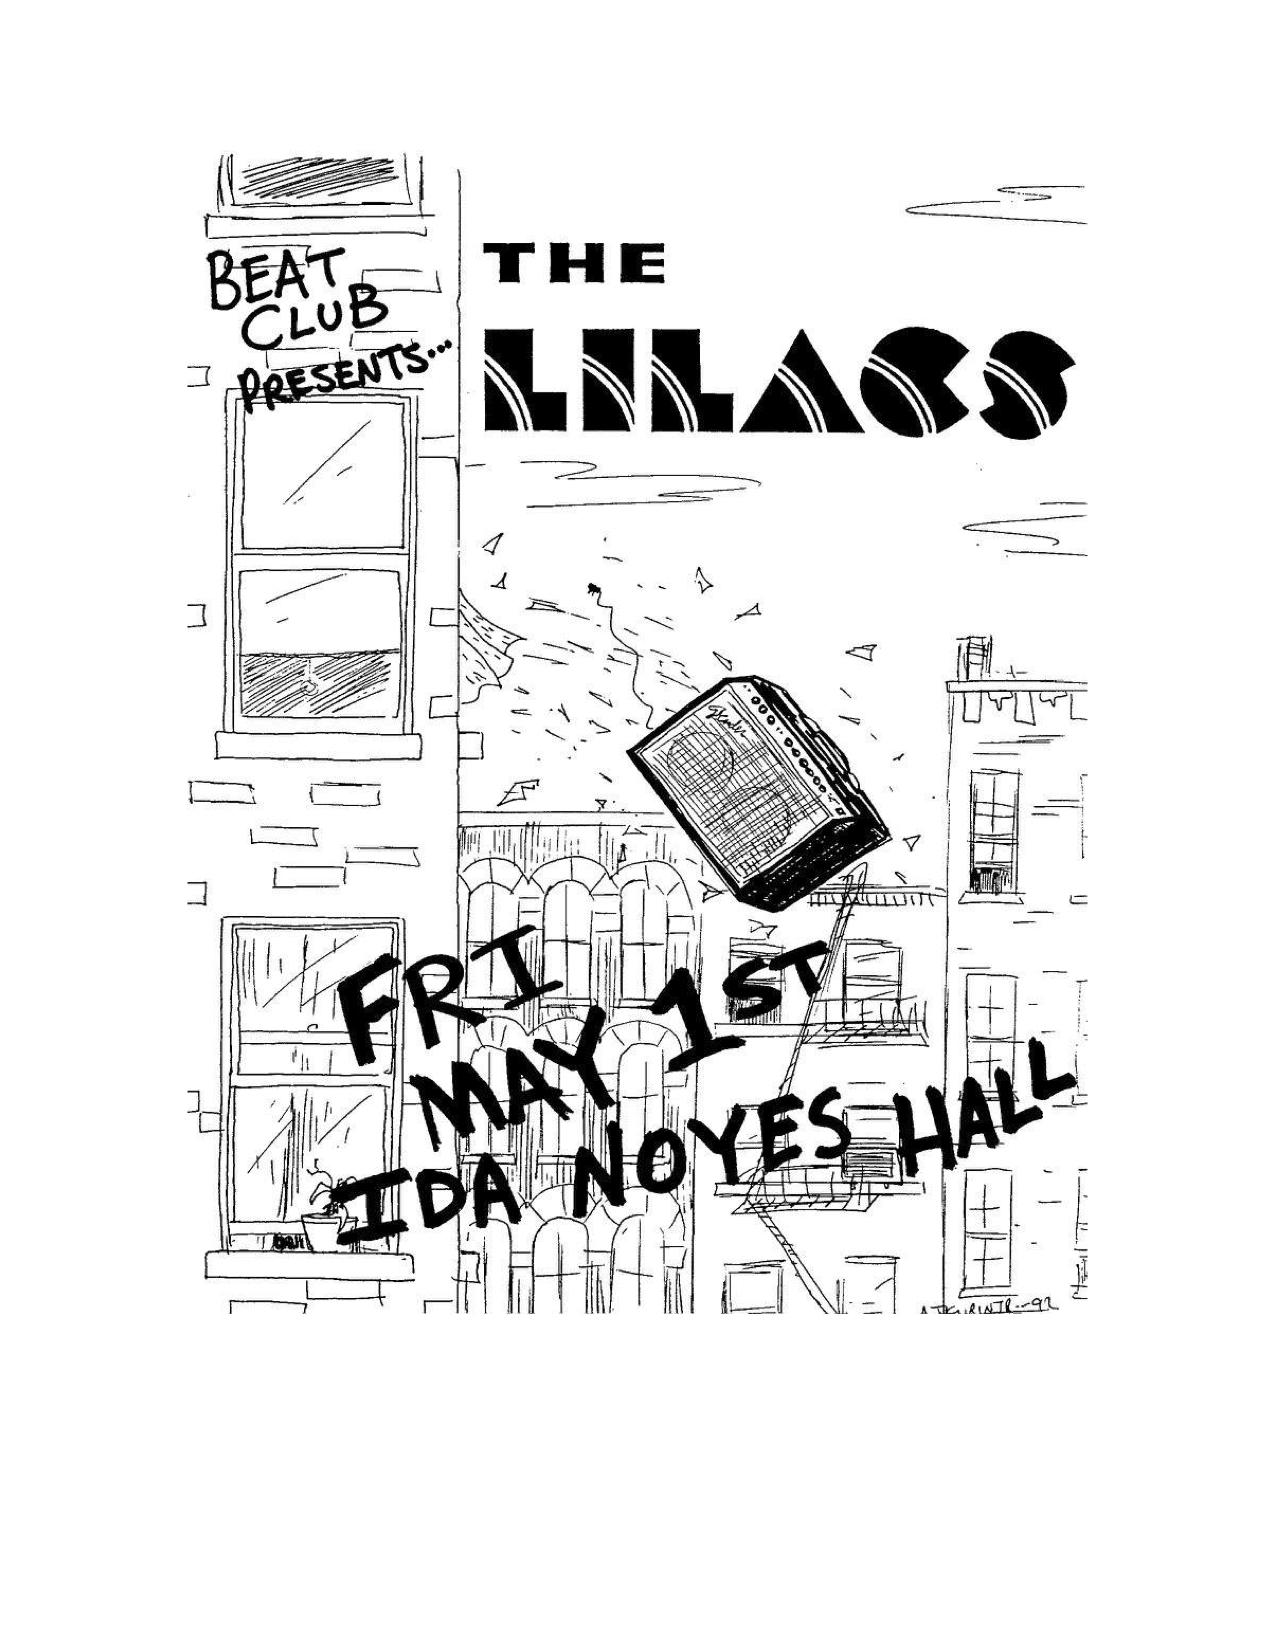 The Lilacs Poster 34 (Ida Noyes).jpg